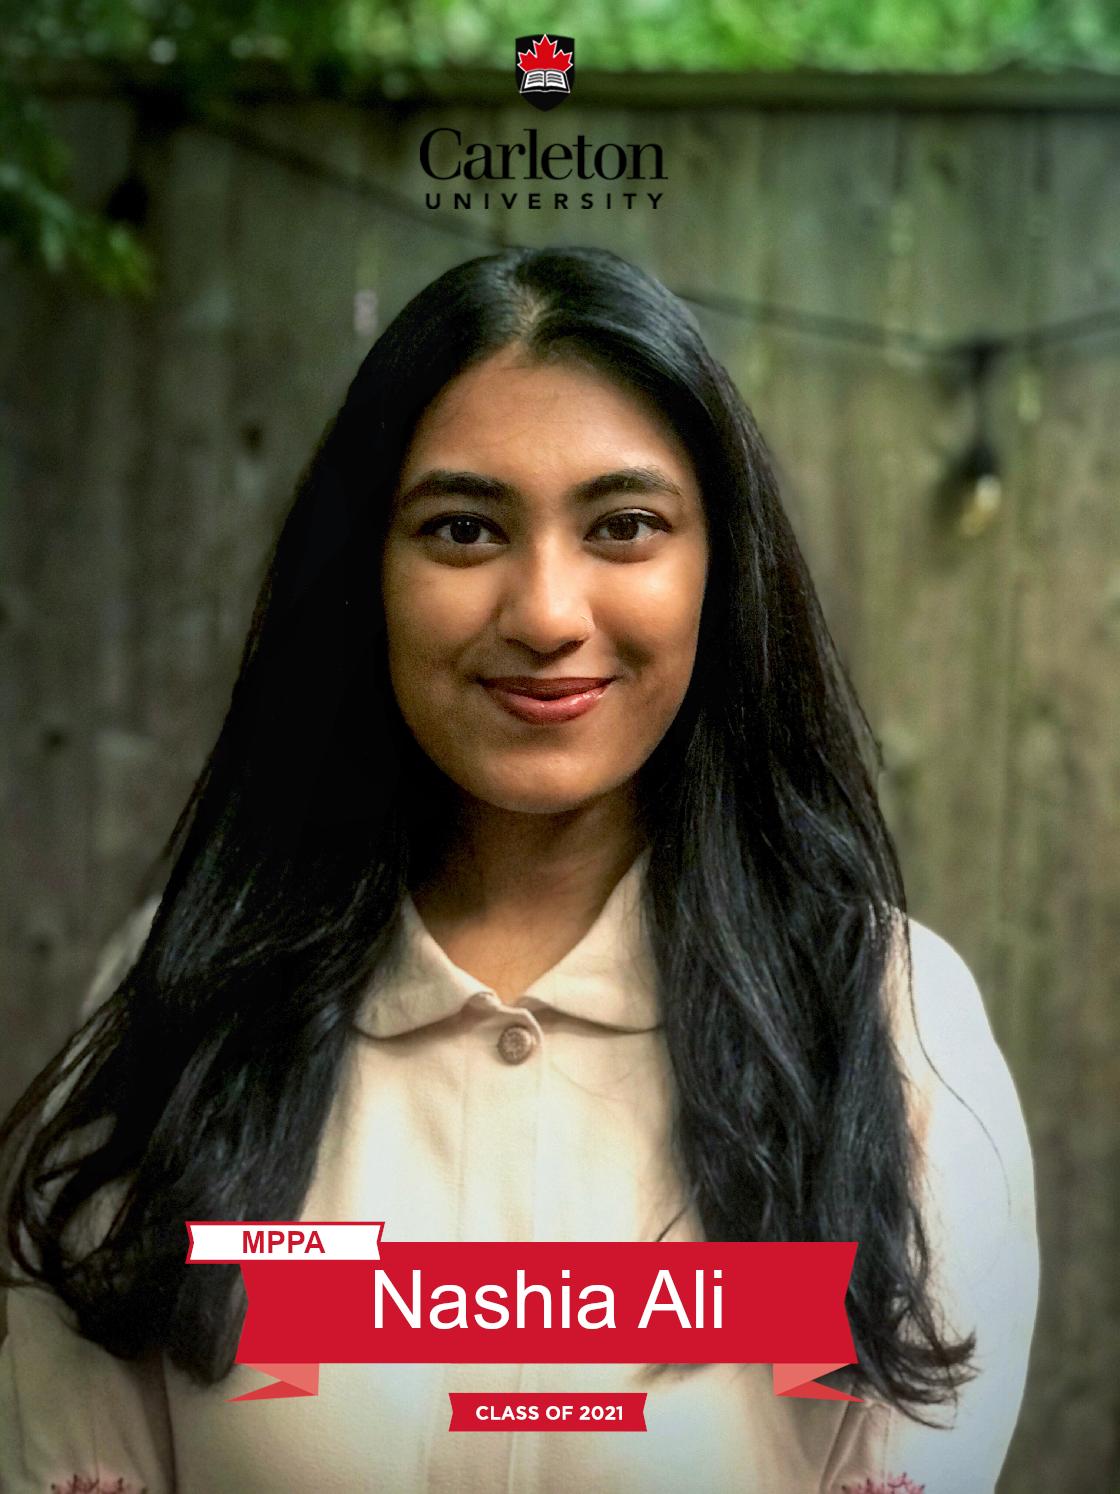 Nashia Ali. MPPA graduate, class of 2021